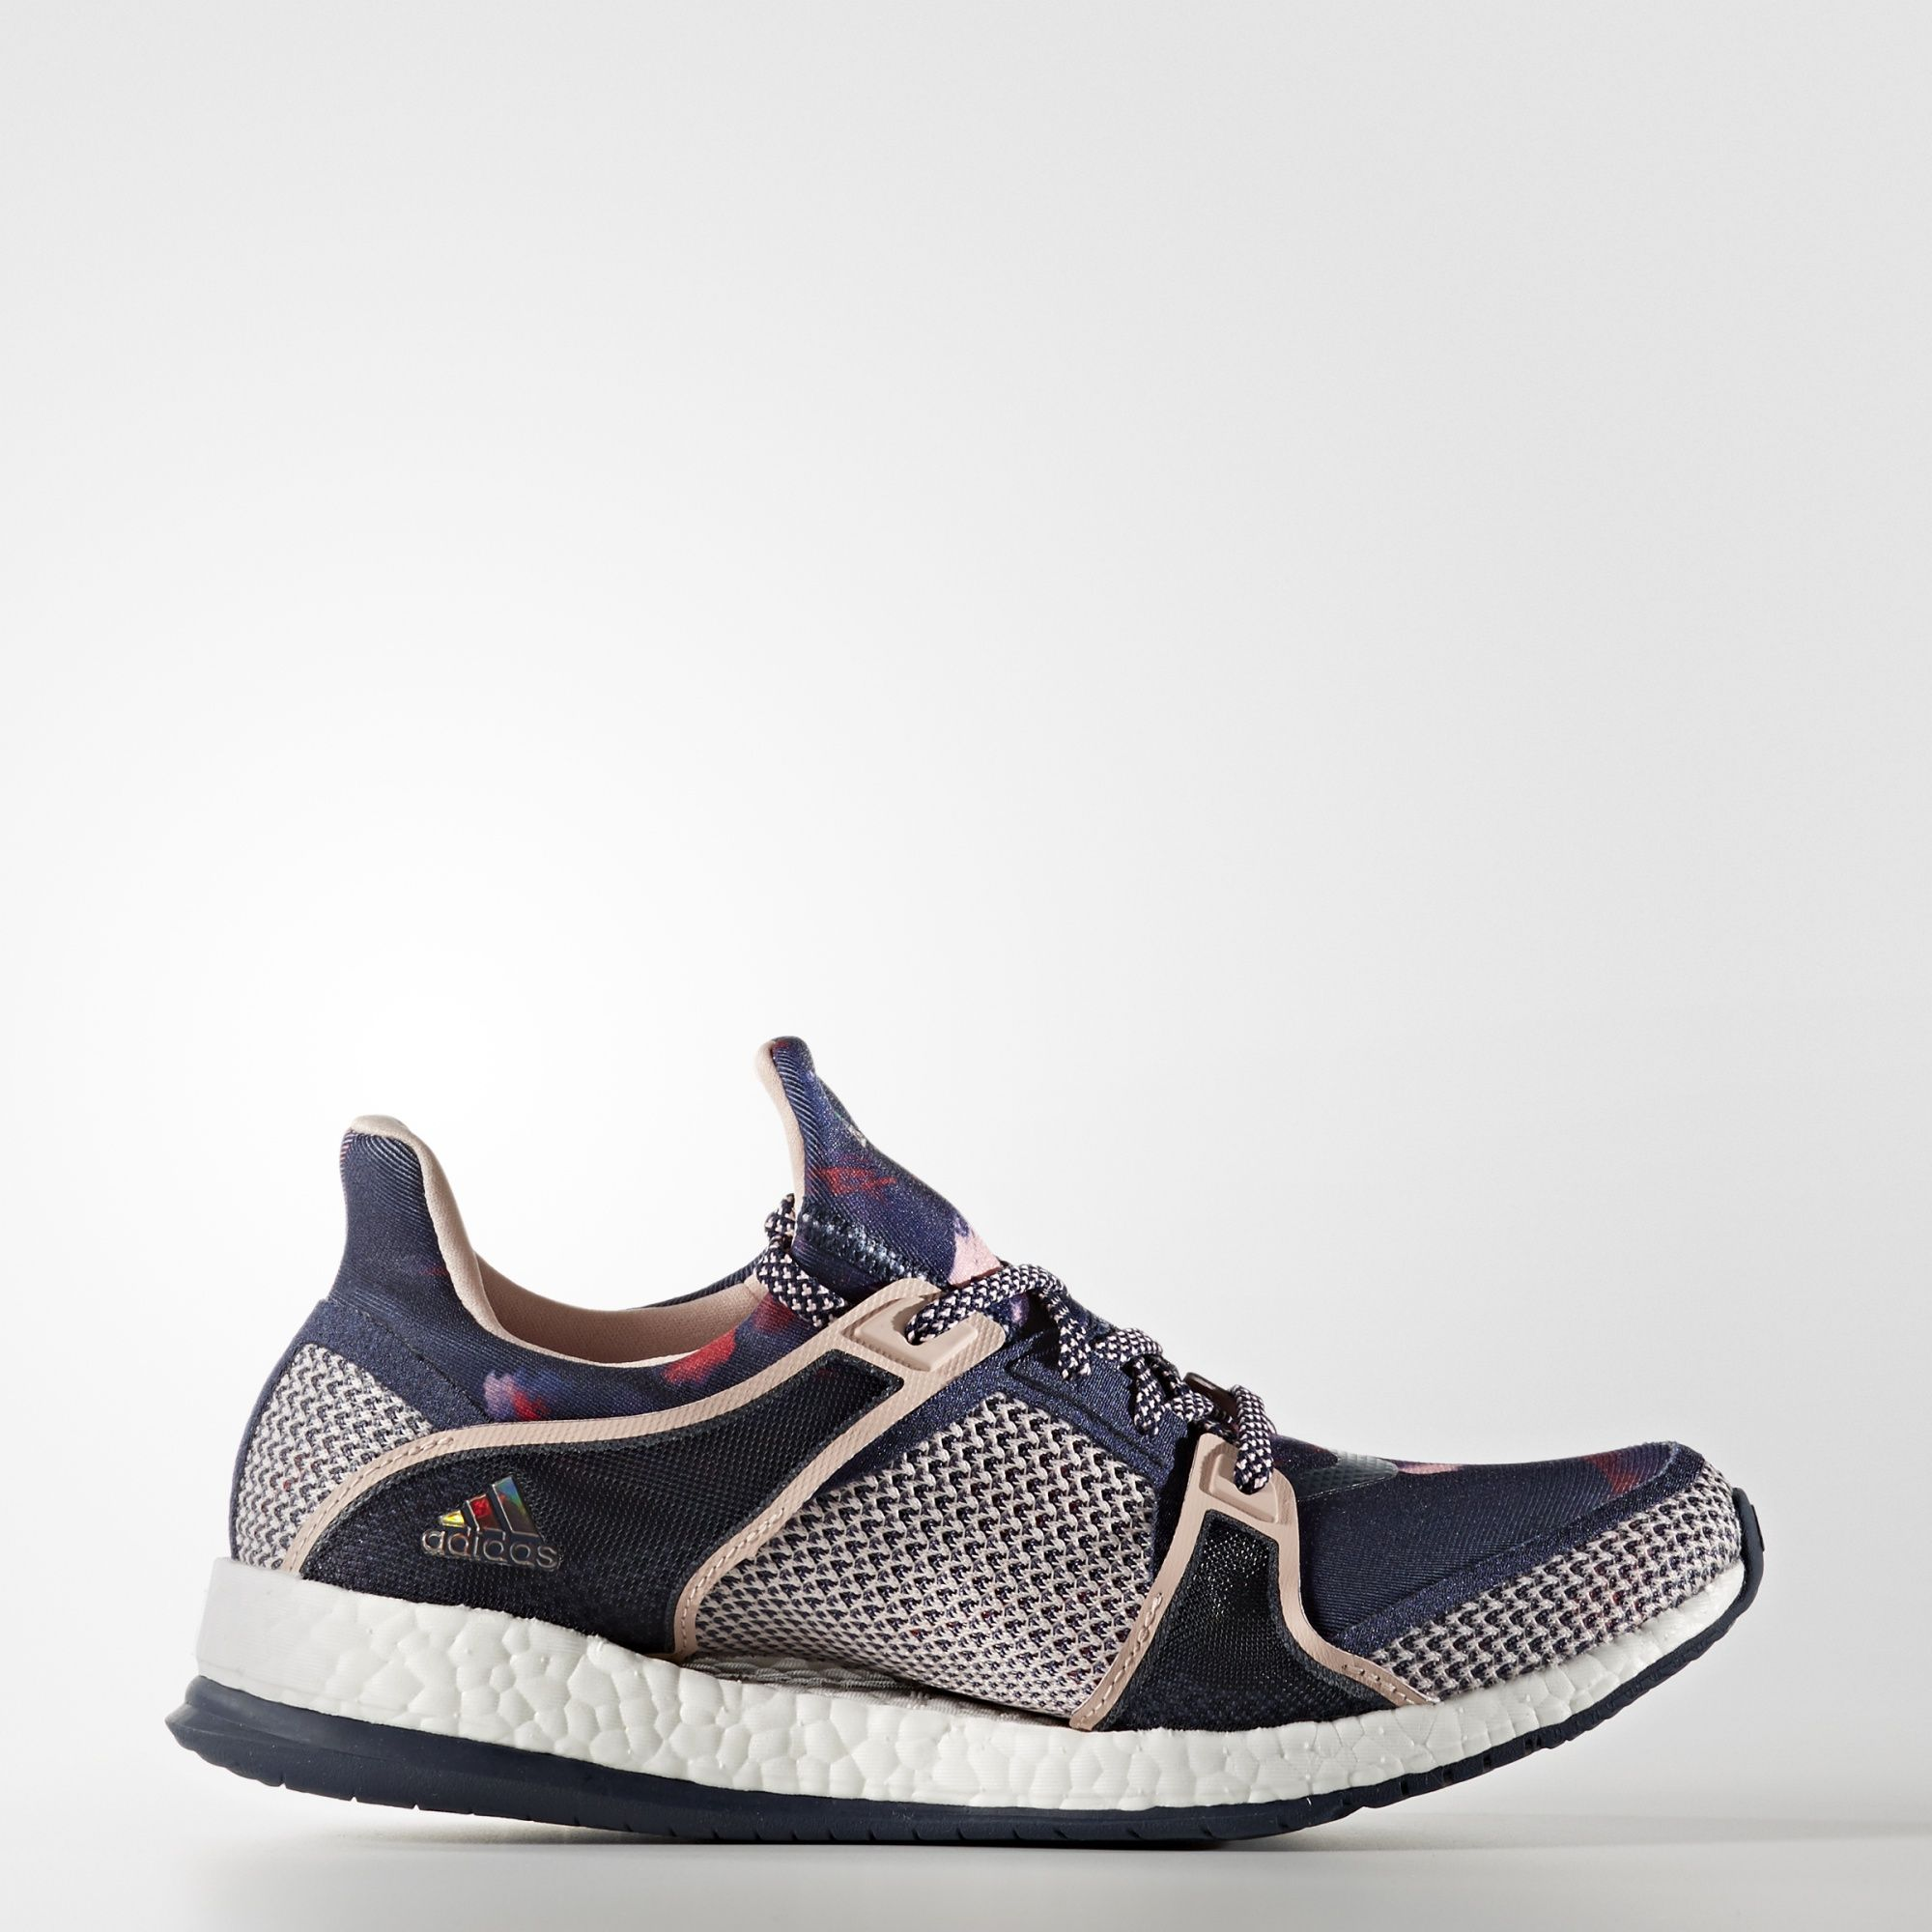 Adidas Pure Boost X Training Shoes Blue Adidas Us Adidas Shoes Women Adidas Pure Boost Running Shoes Design